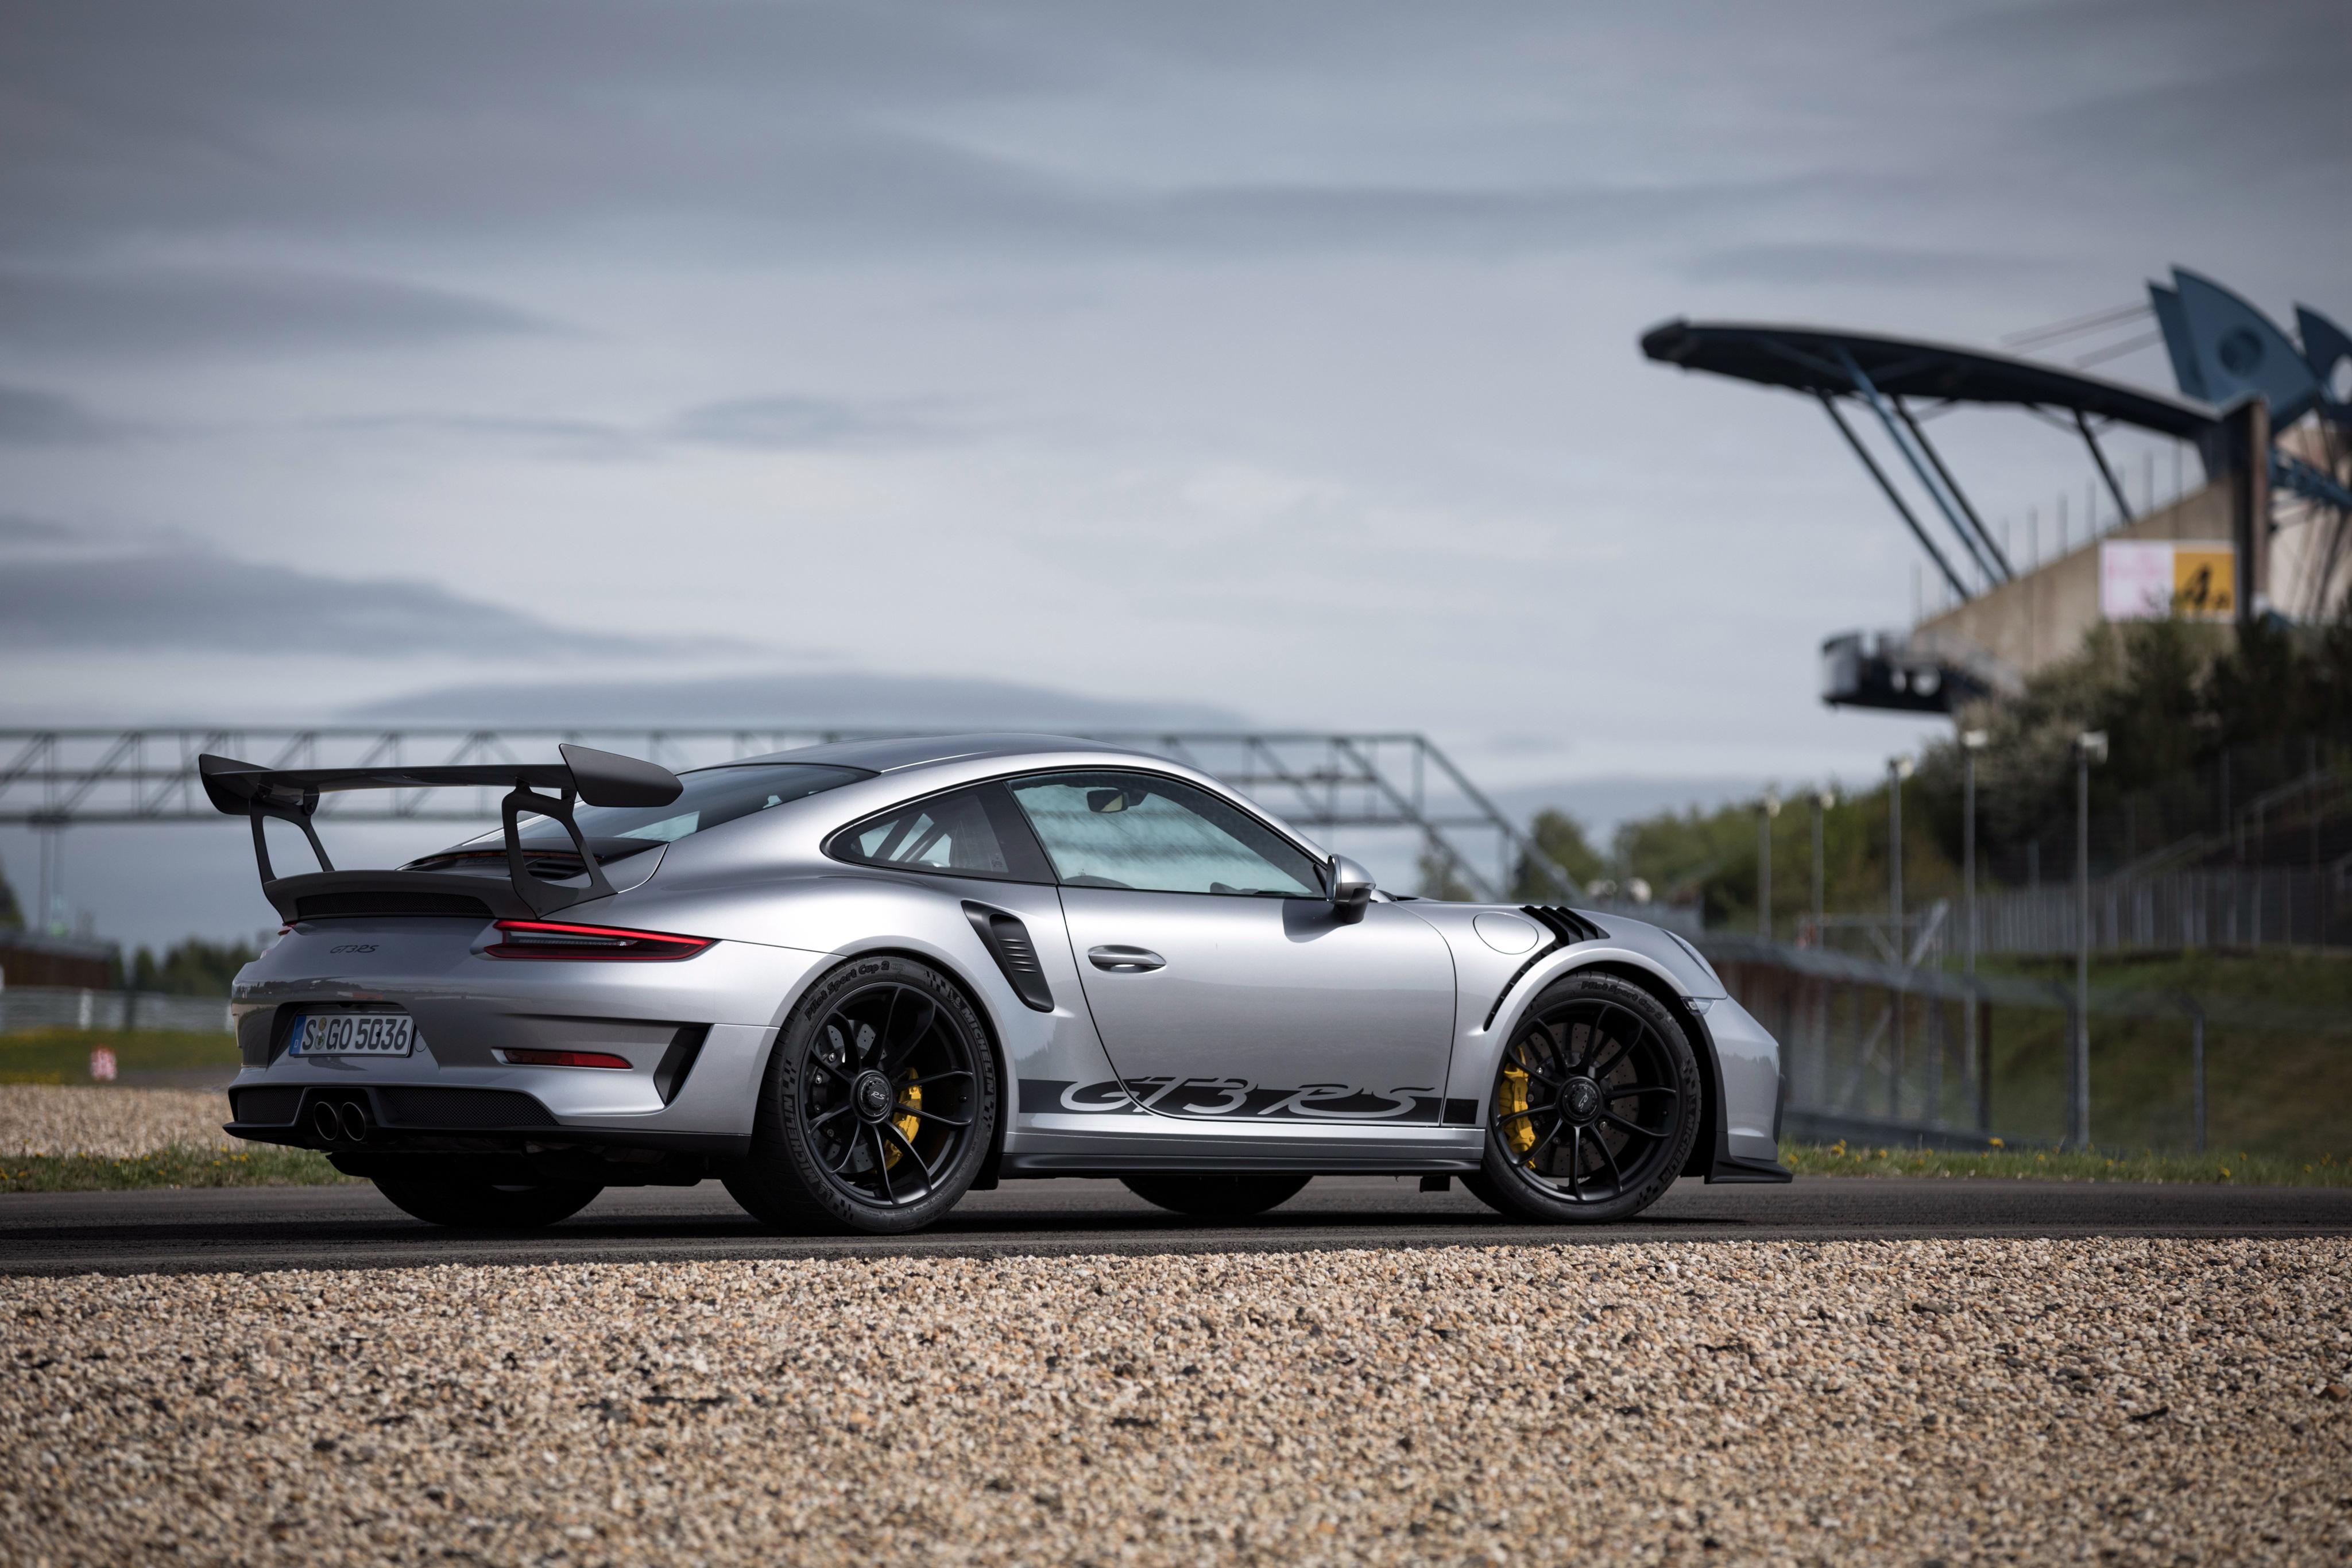 4k Porsche 911 GT3 RS, HD Cars, 4k Wallpapers, Images